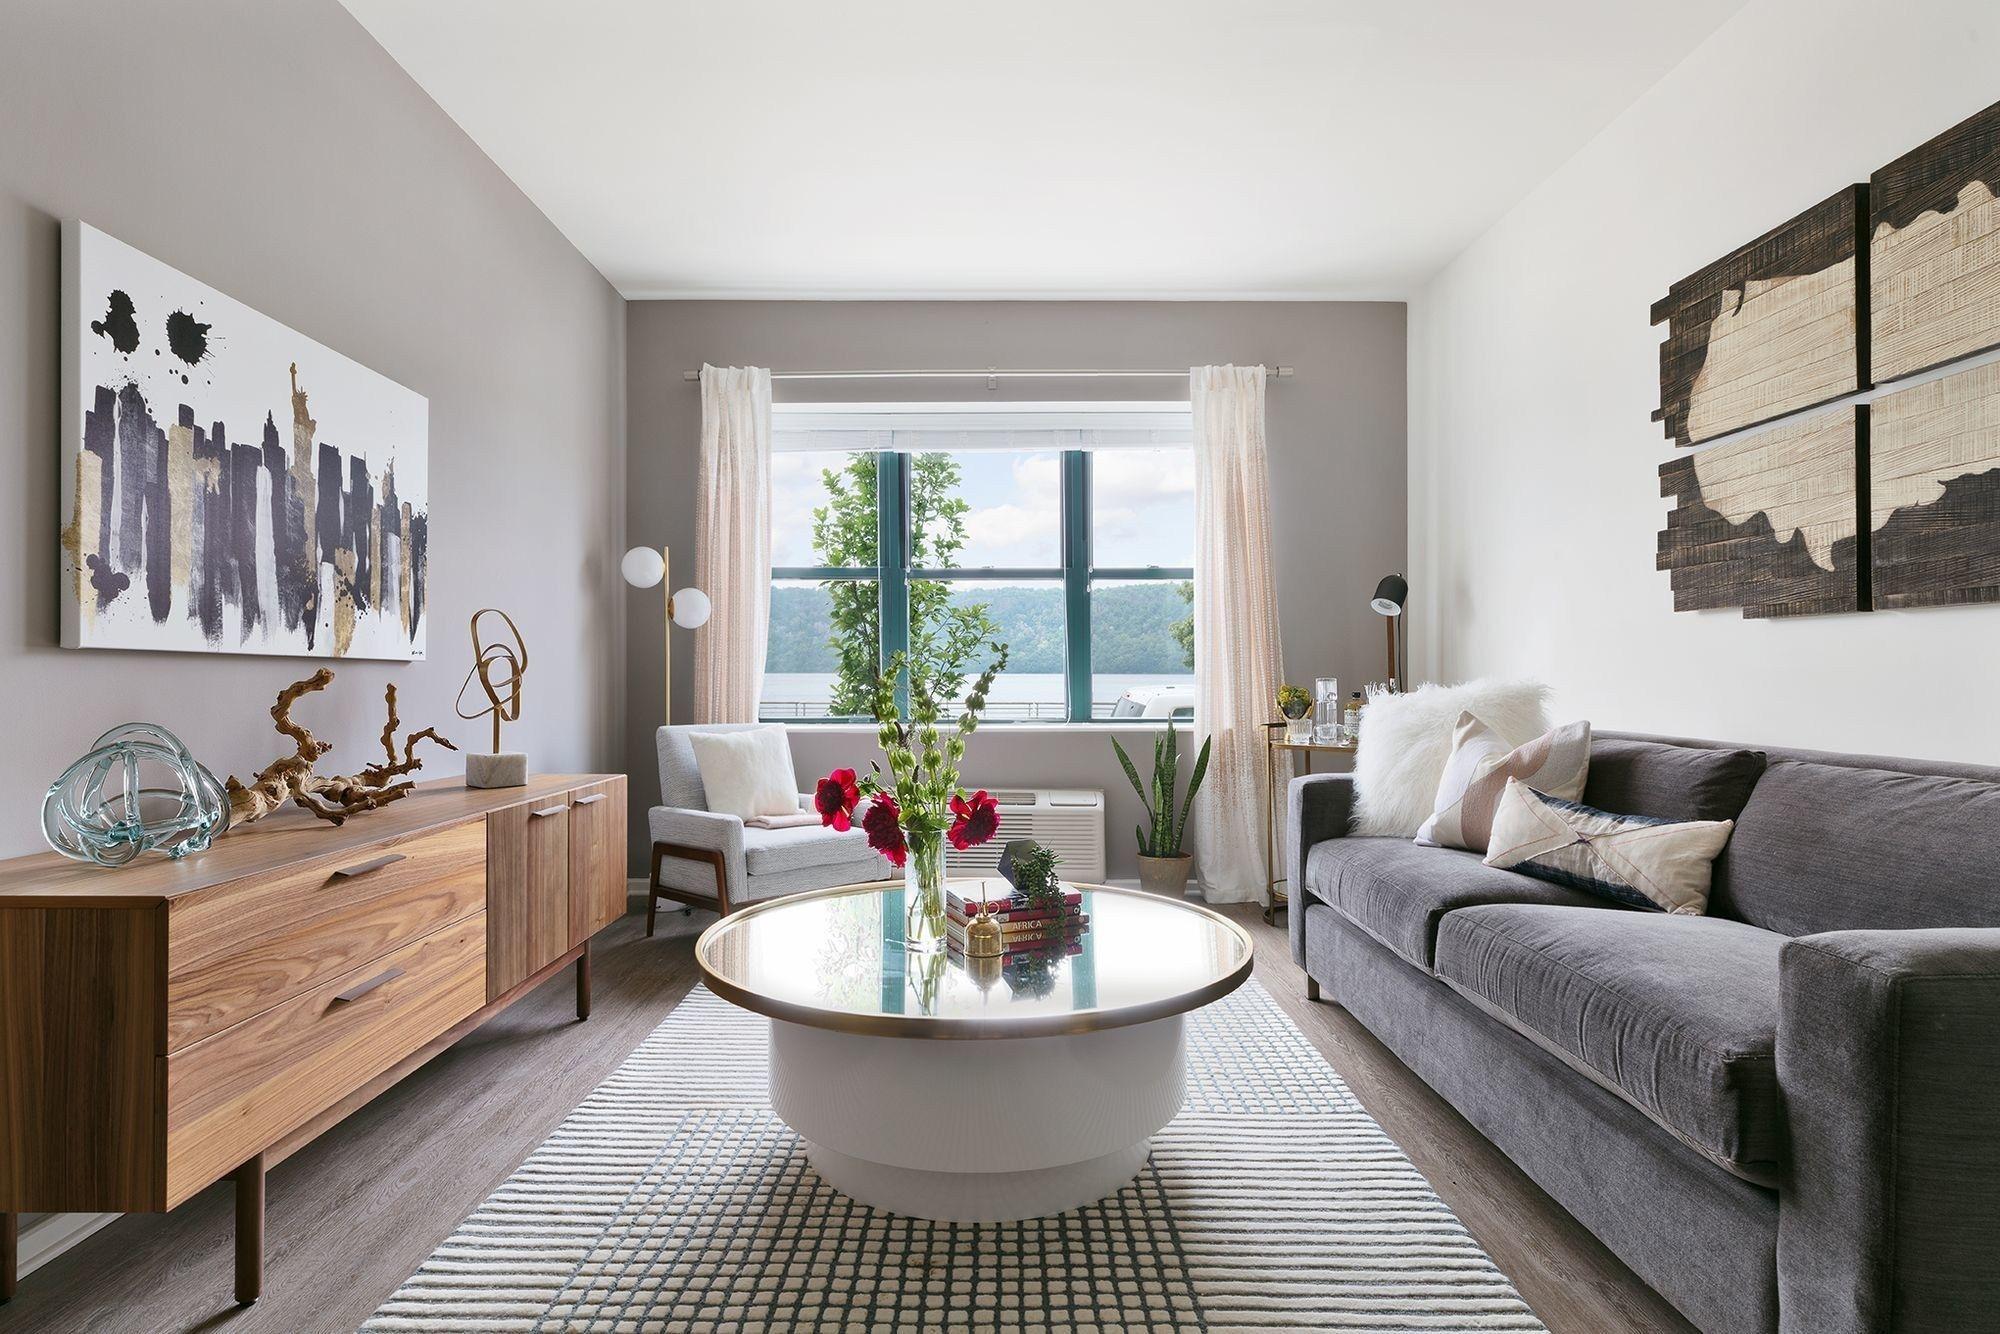 Luxury One Bedroom Apartments In Newark Nj One bedroom